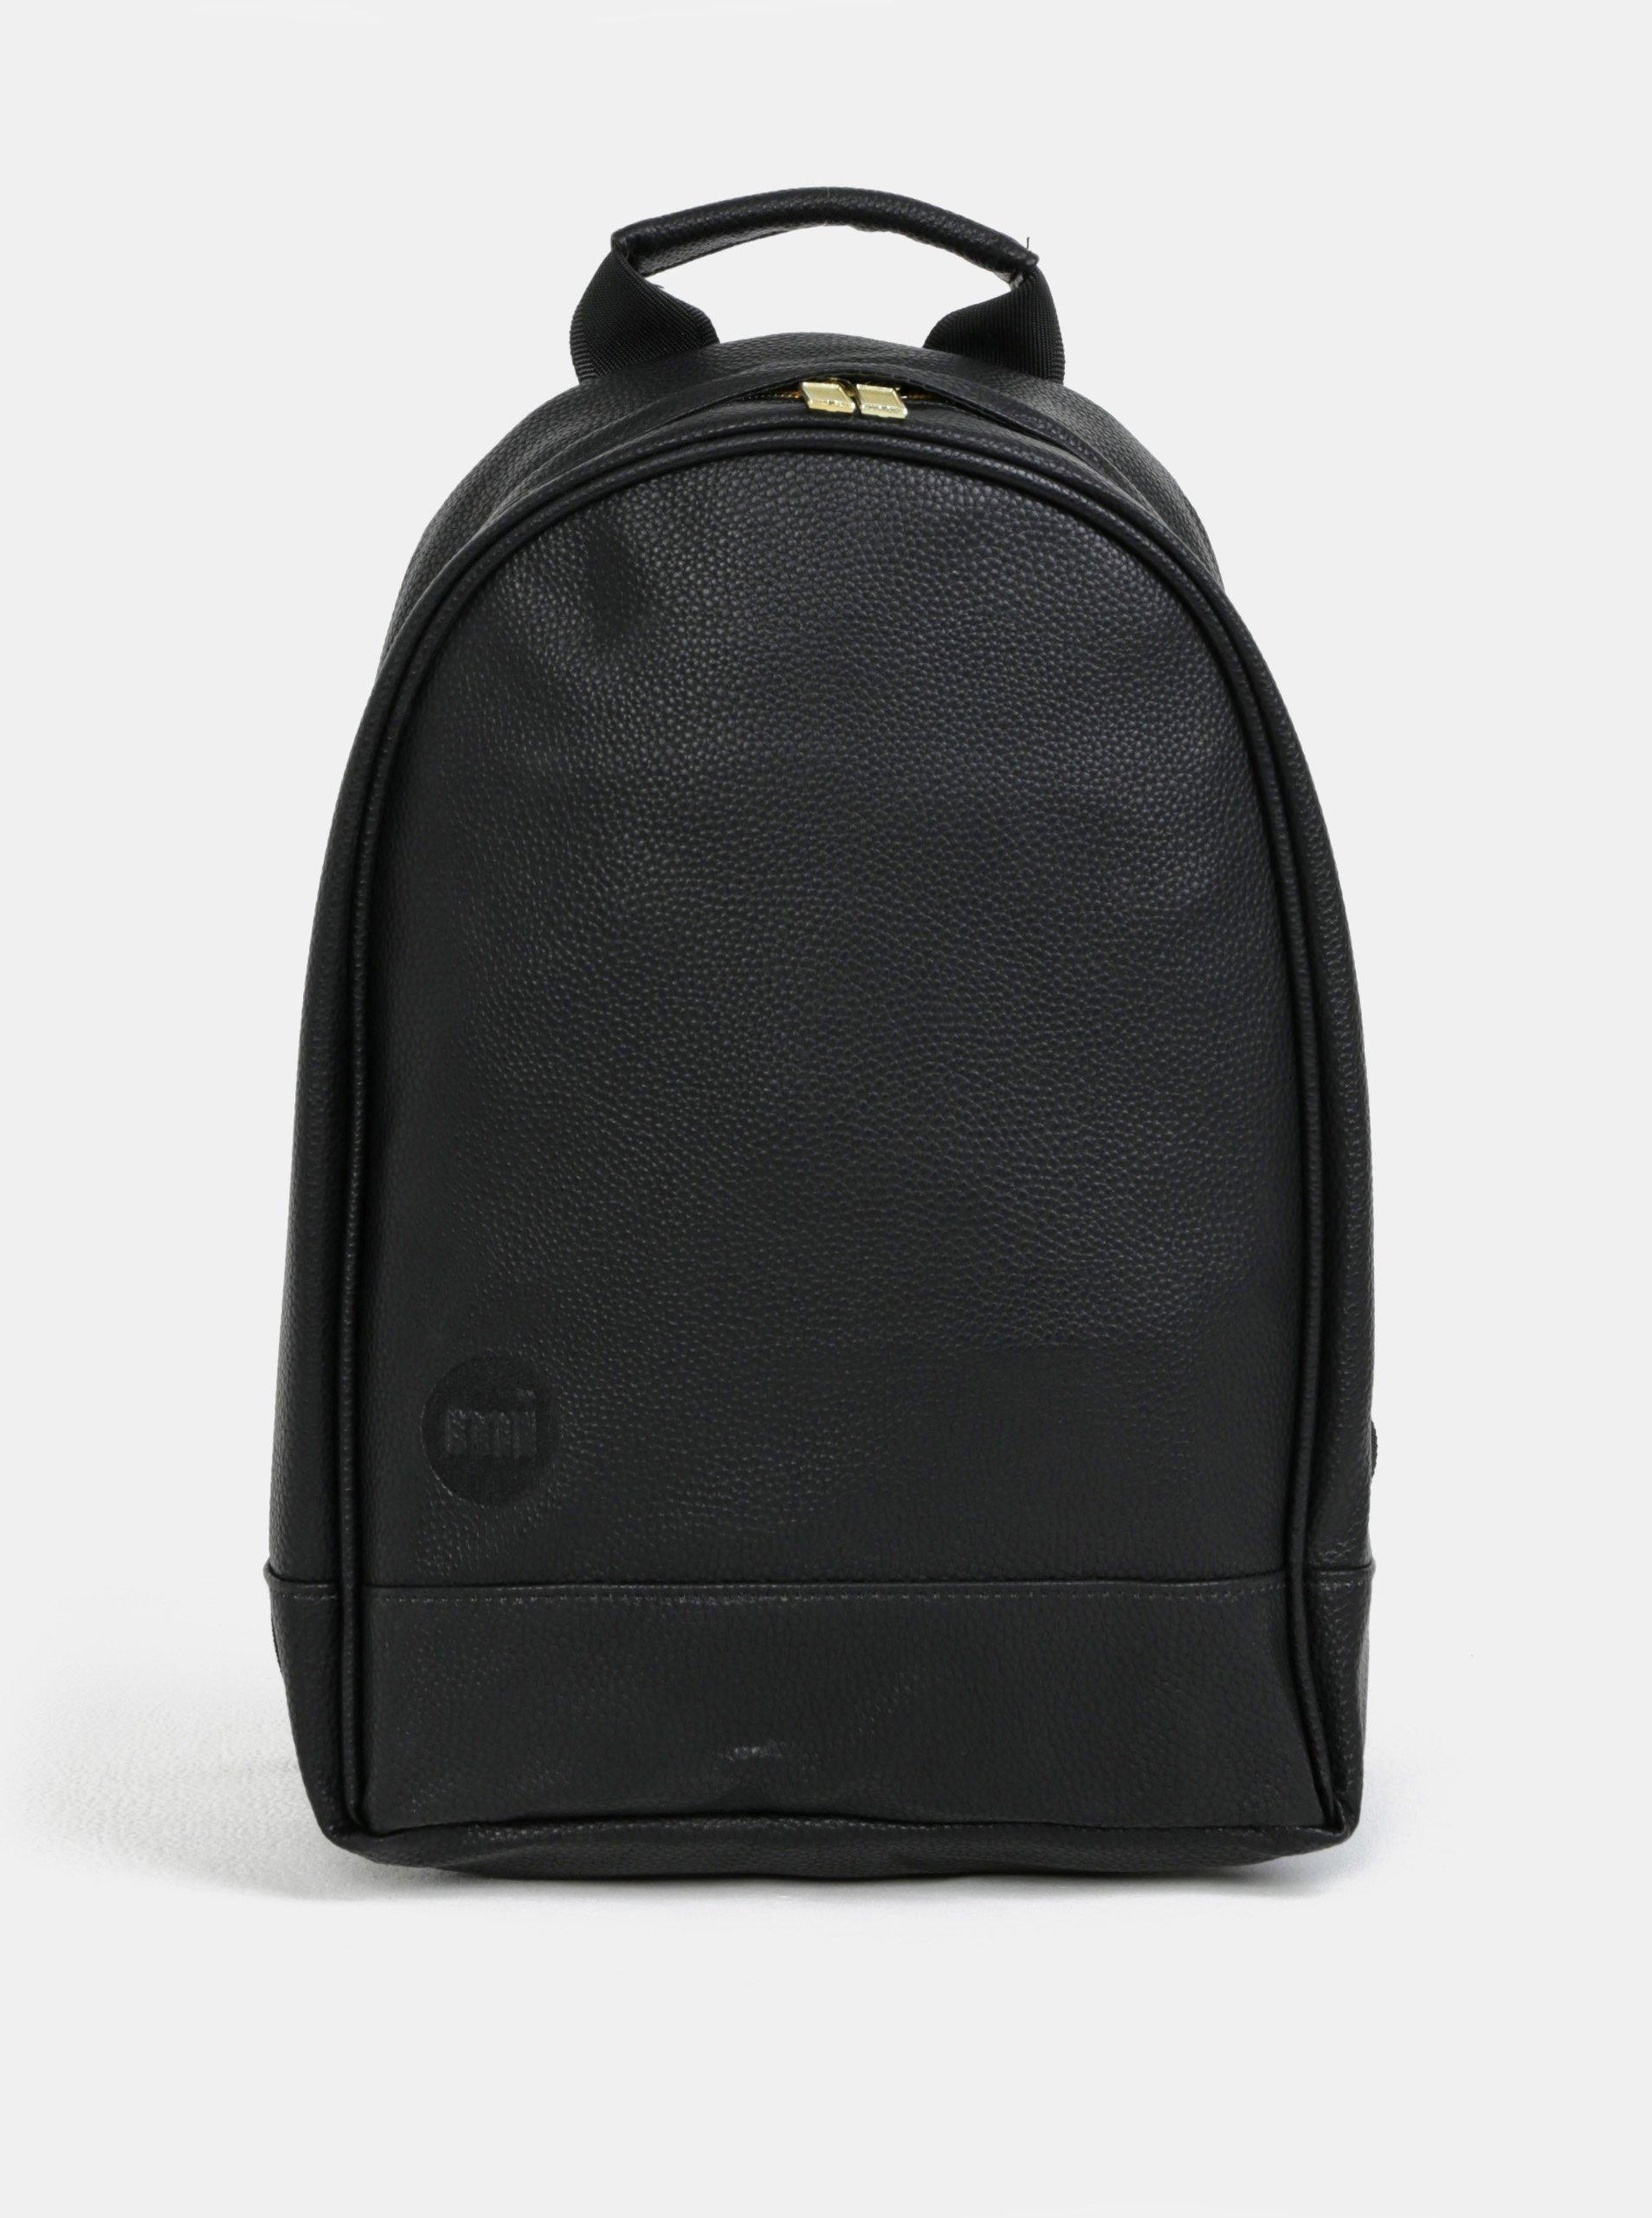 Čierny batoh s jemným vzorom Mi-Pac XS Tumbled 33fca035c8